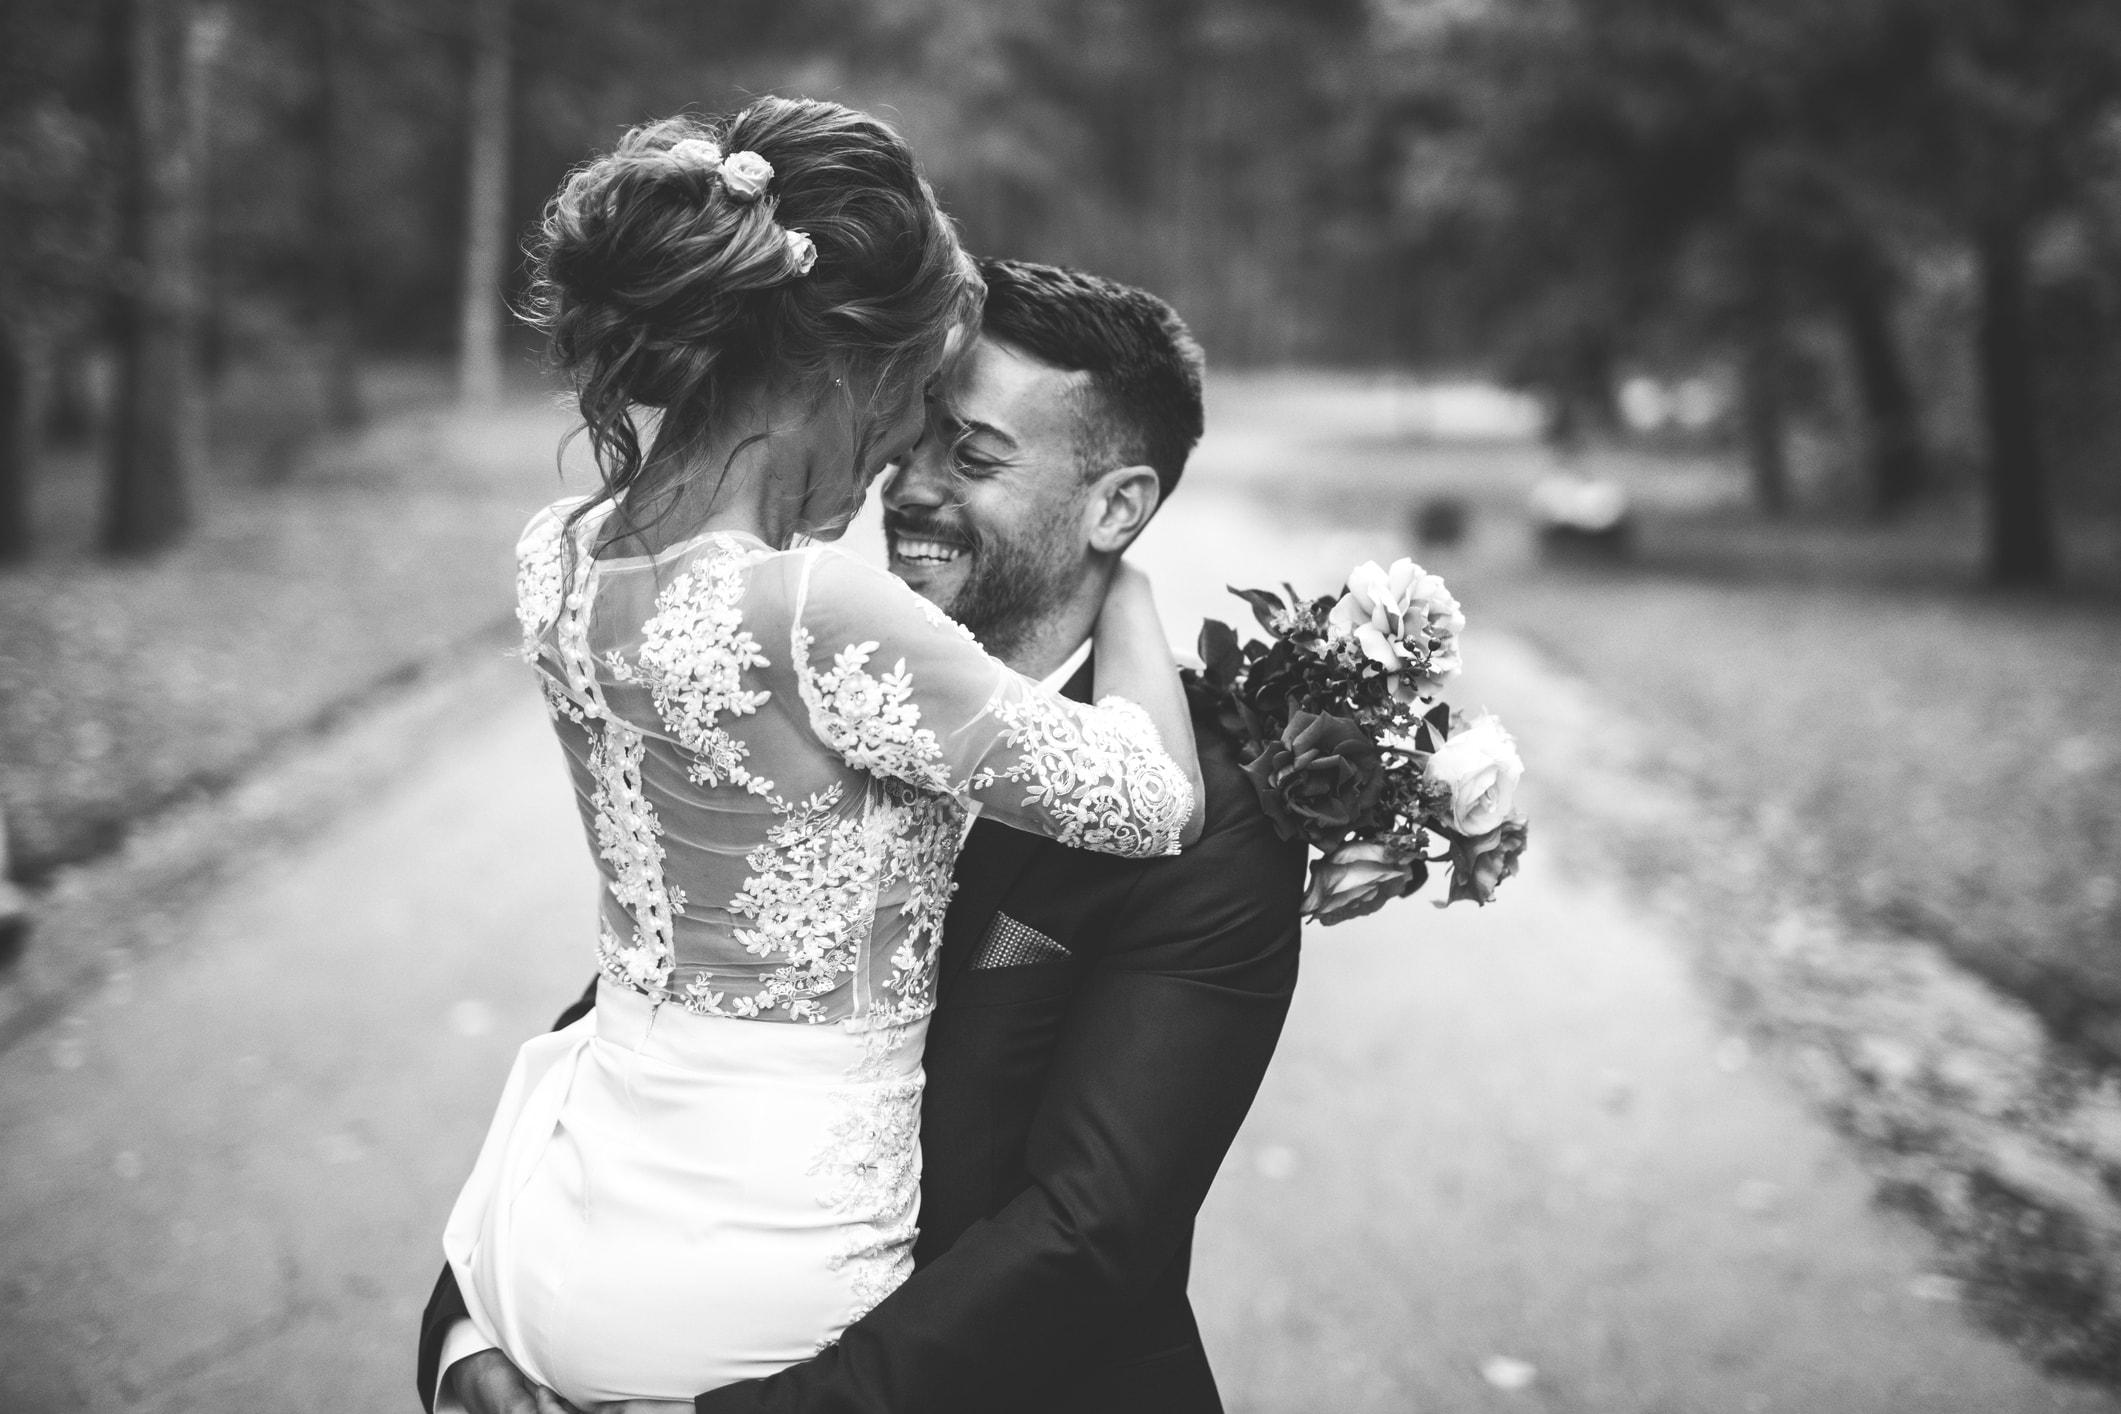 wedding photography problems image